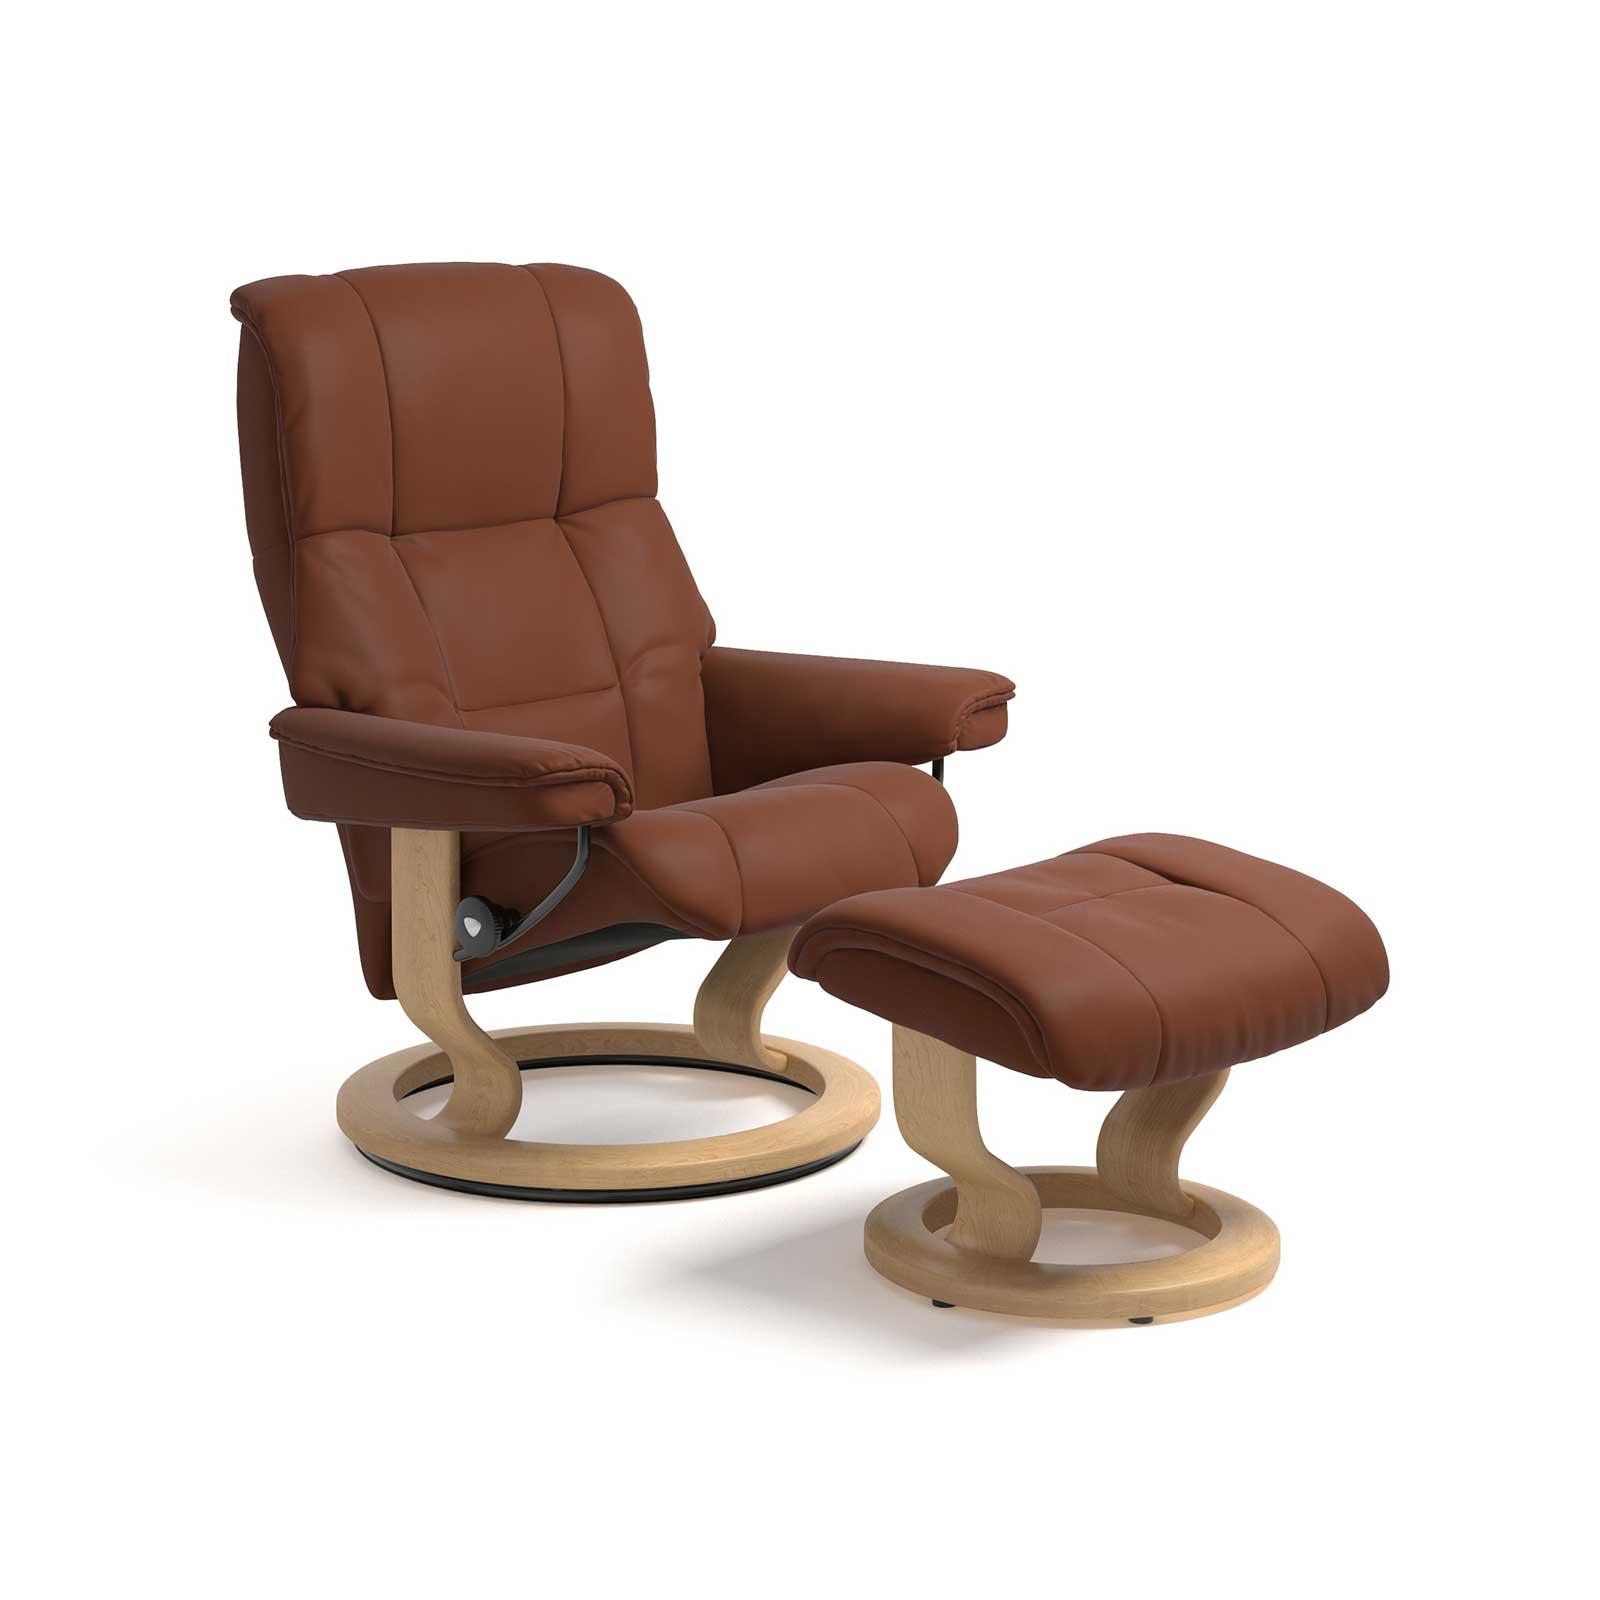 stressless sessel mayfair paloma copper classic natur hocker. Black Bedroom Furniture Sets. Home Design Ideas